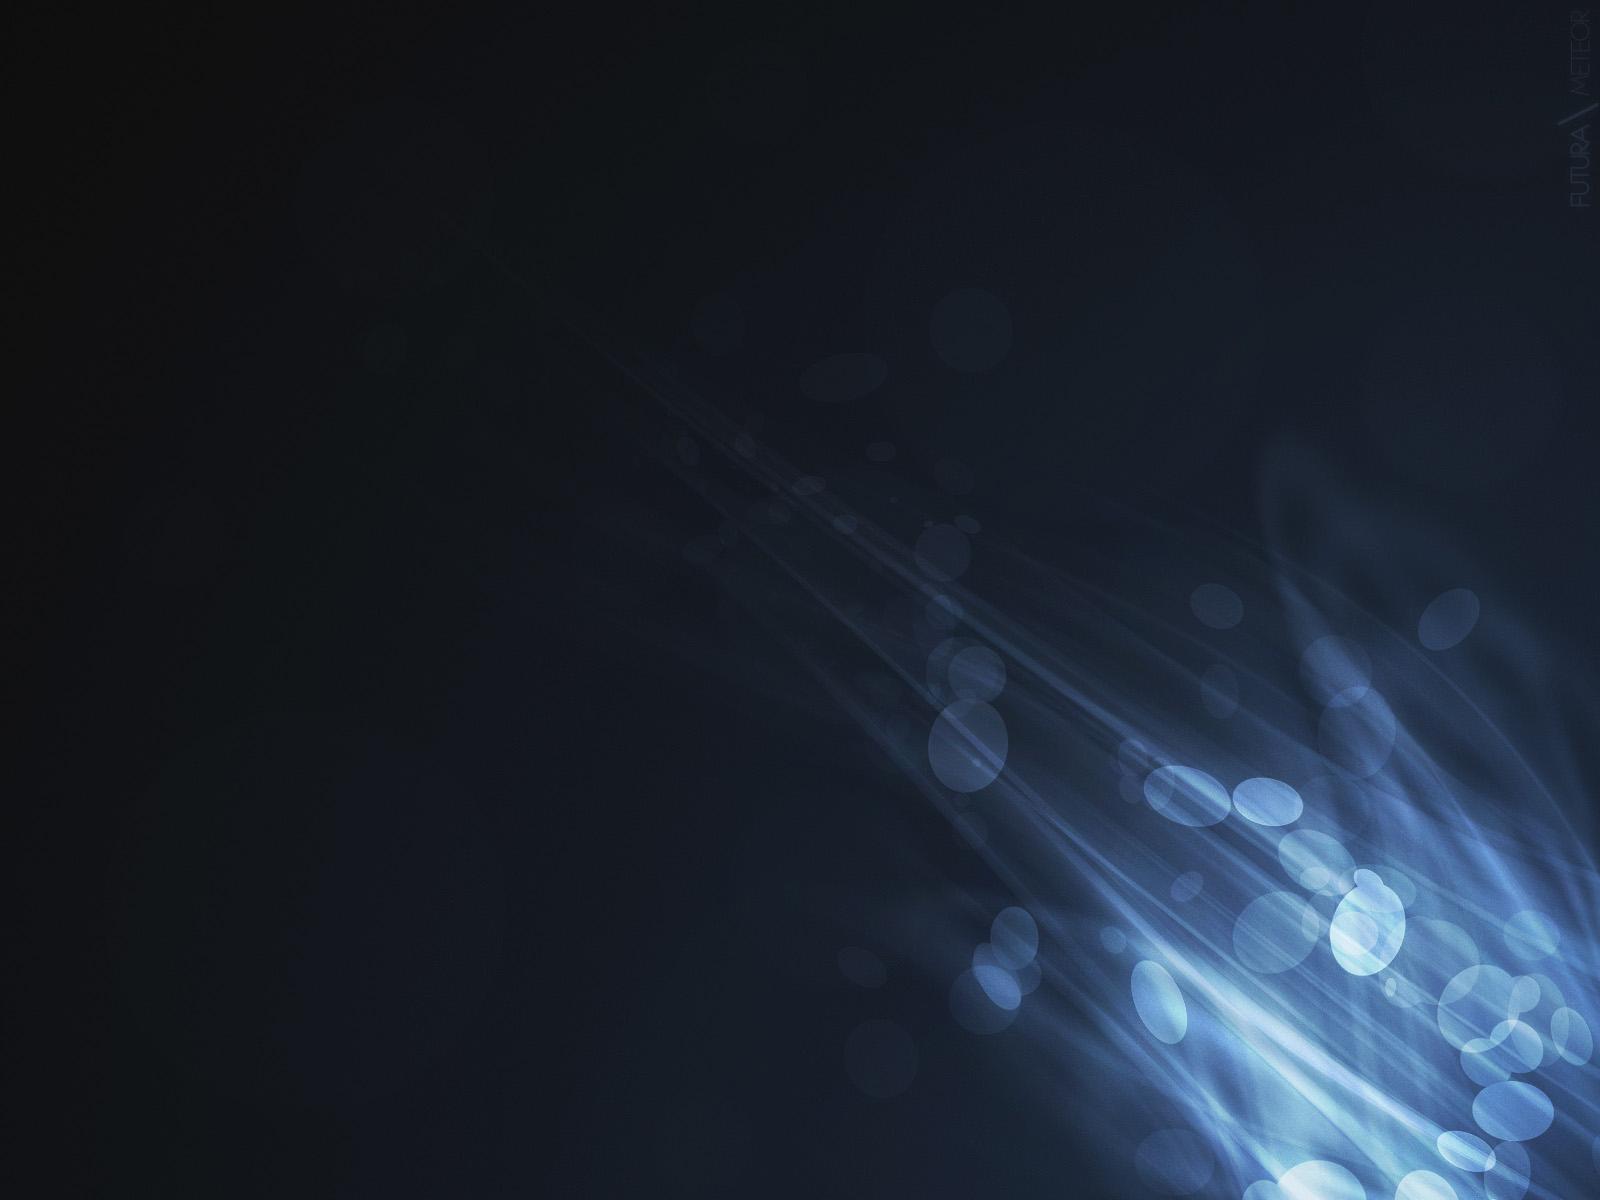 【PS教程】{魔殿の冬季}---『调色篇:冰篮』 - f12lian - 缘份的天空